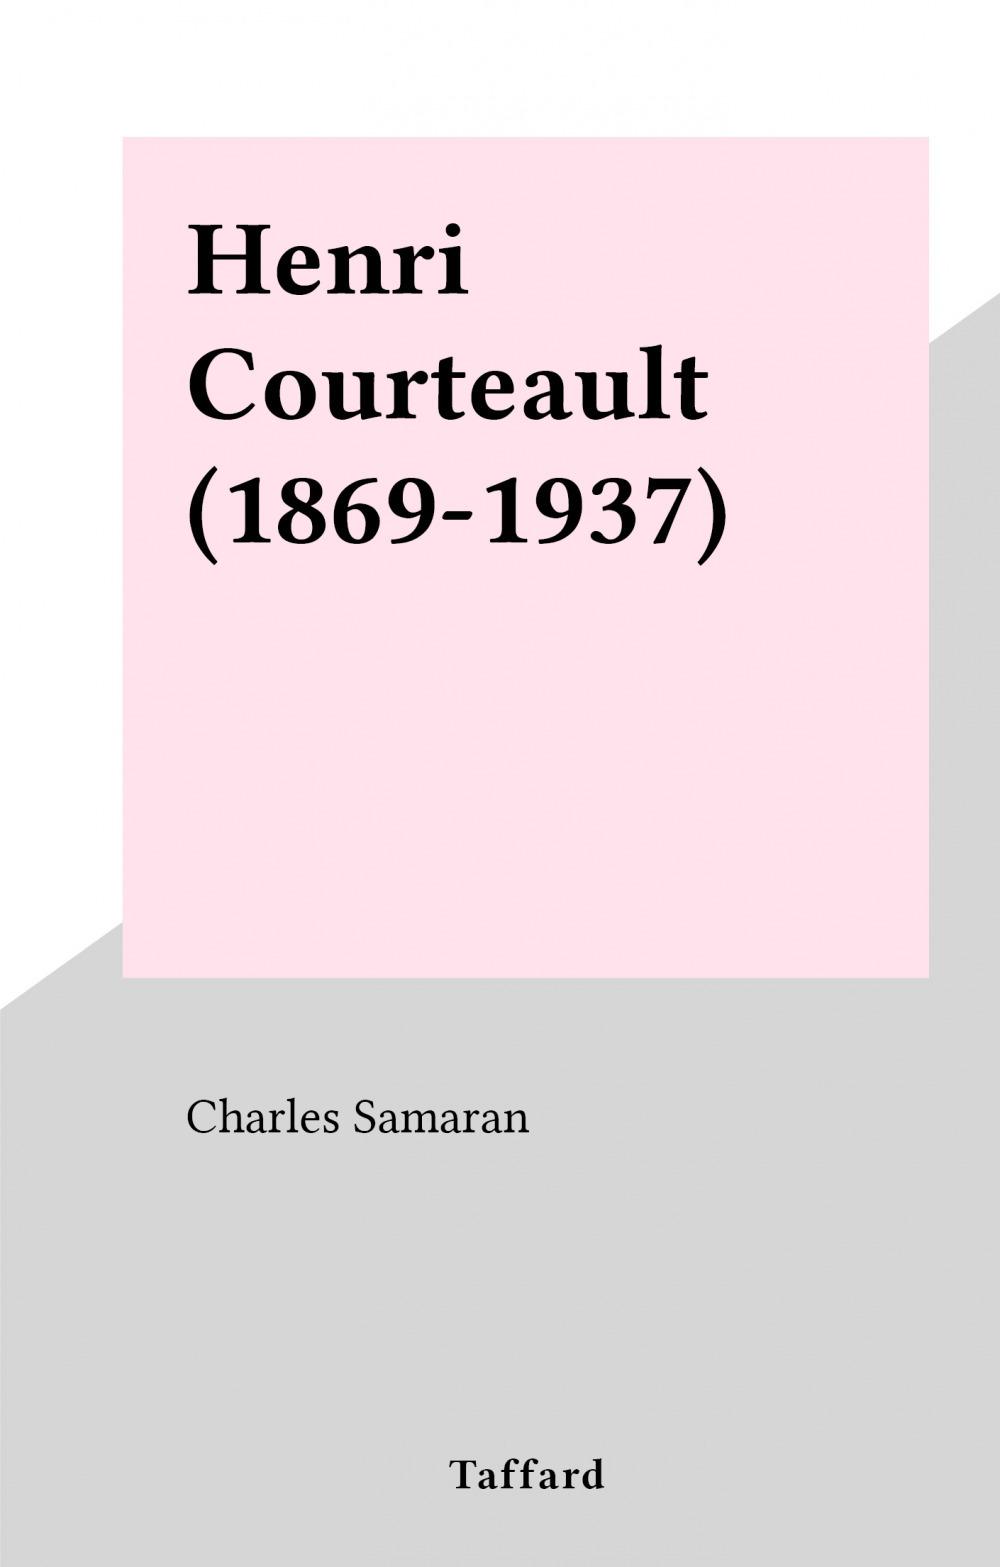 Henri Courteault (1869-1937)